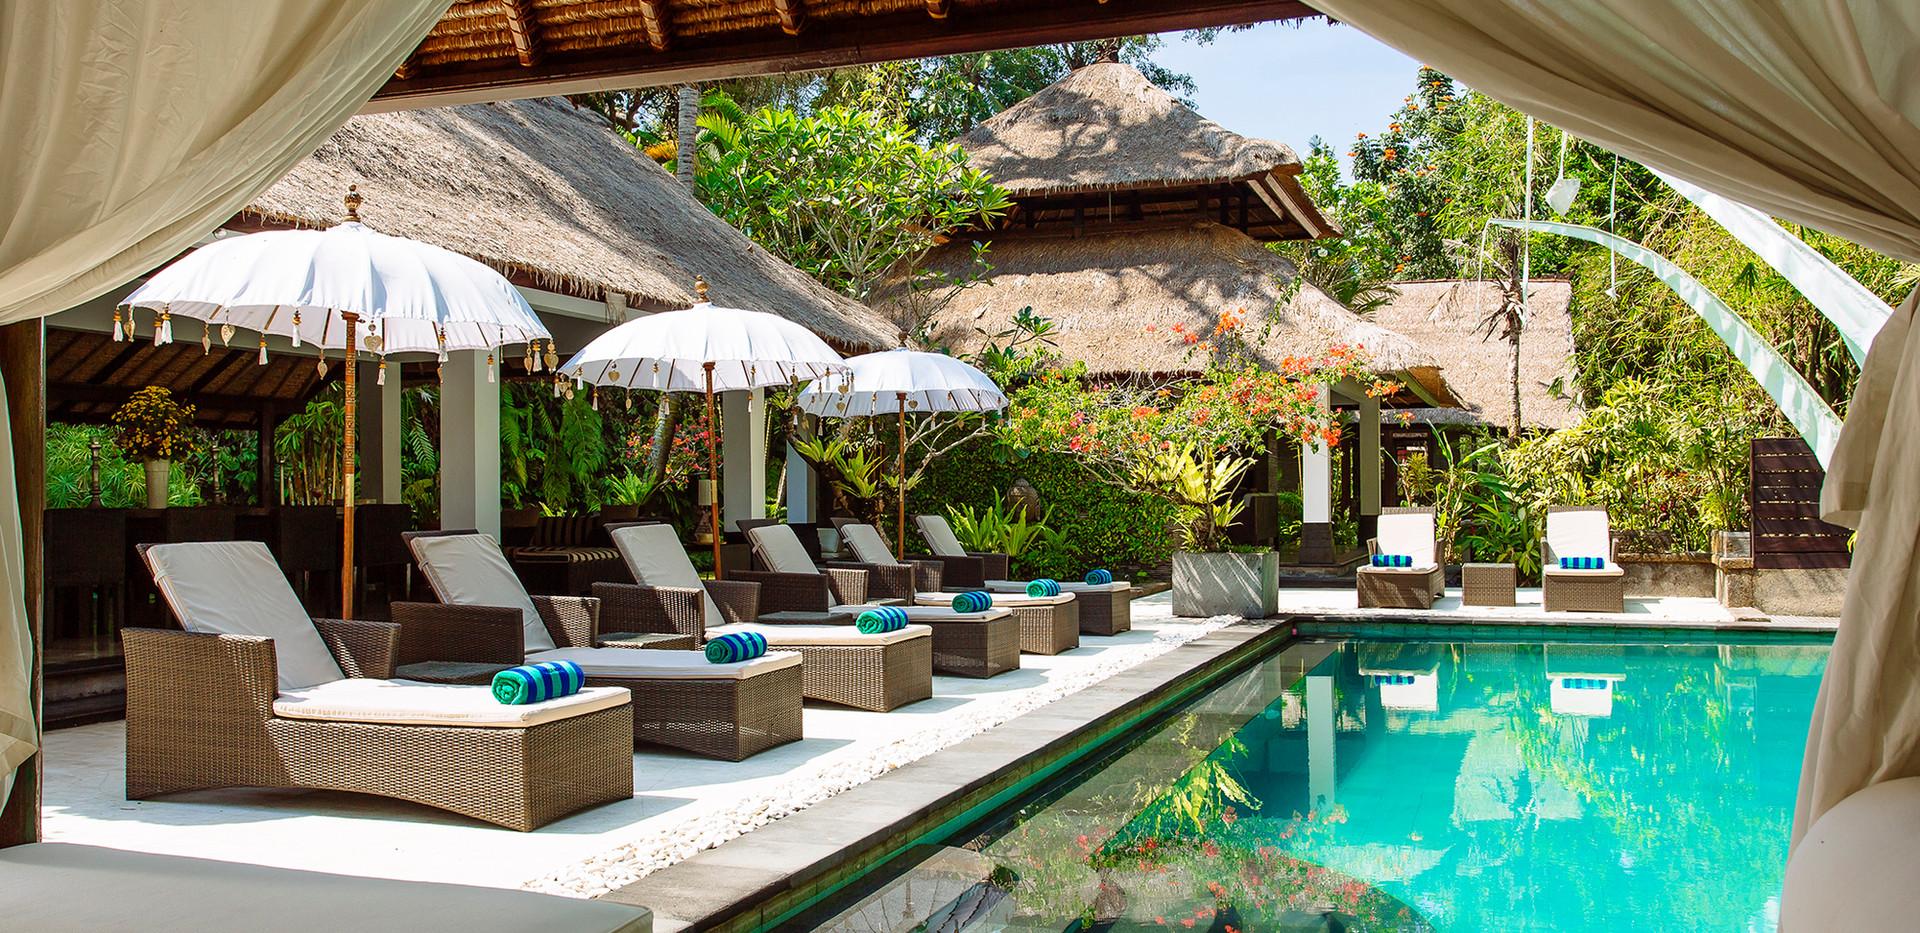 02-Villa Maya Retreat - Pool view within